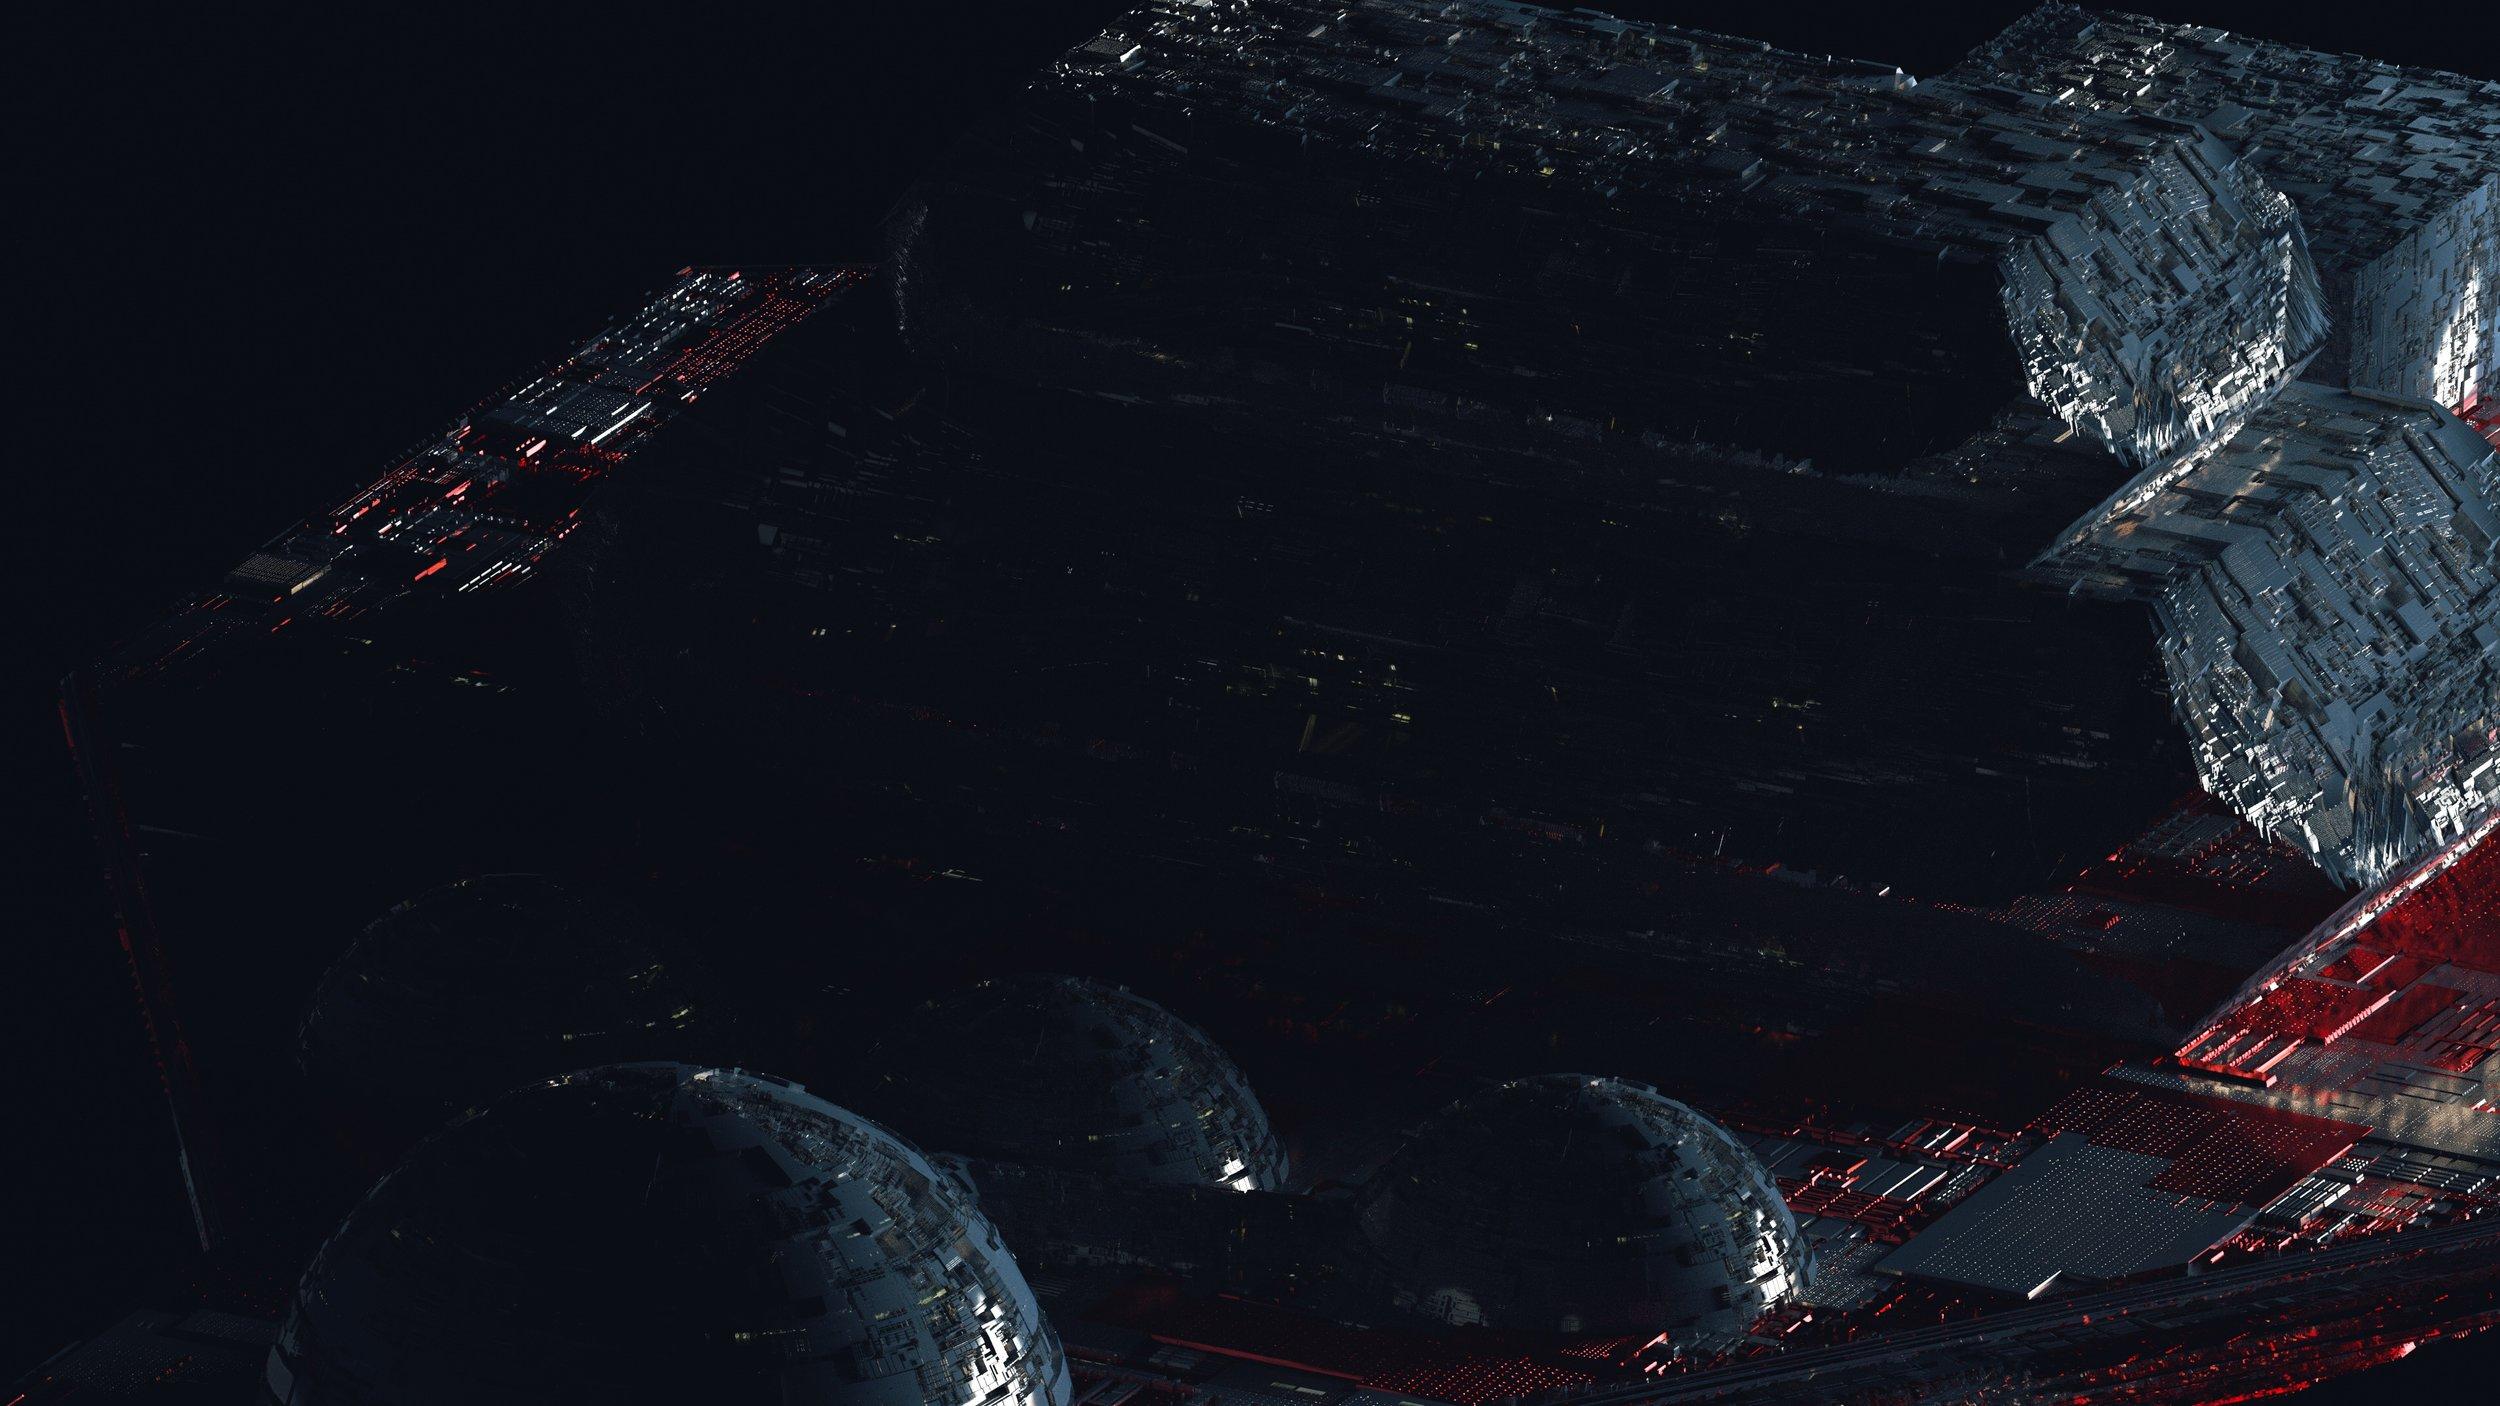 Space_Station_V3 4k.jpg